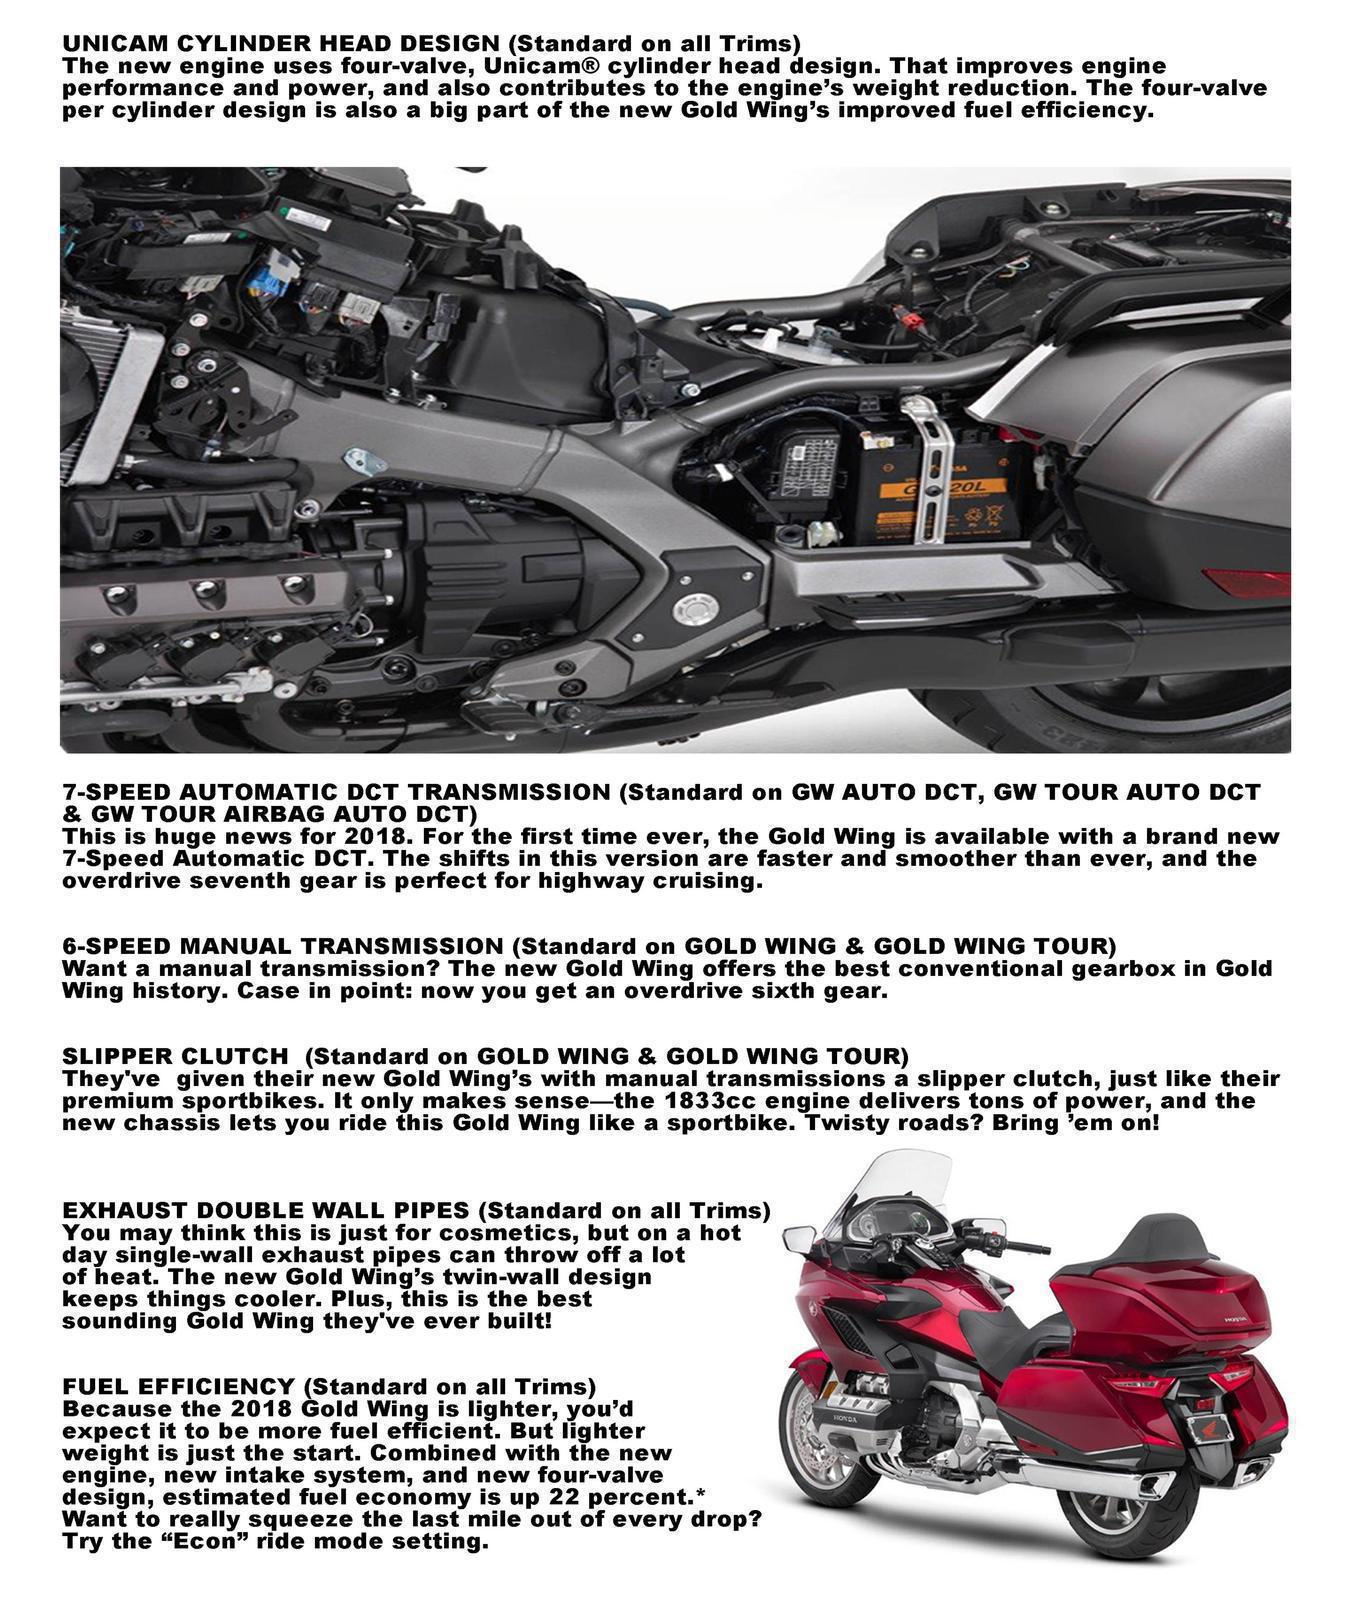 2018 gold wing niehaus cycle sales litchfield il 217 324 6565 rh niehauscycle com 1995 Honda Goldwing 2004 Honda Goldwing